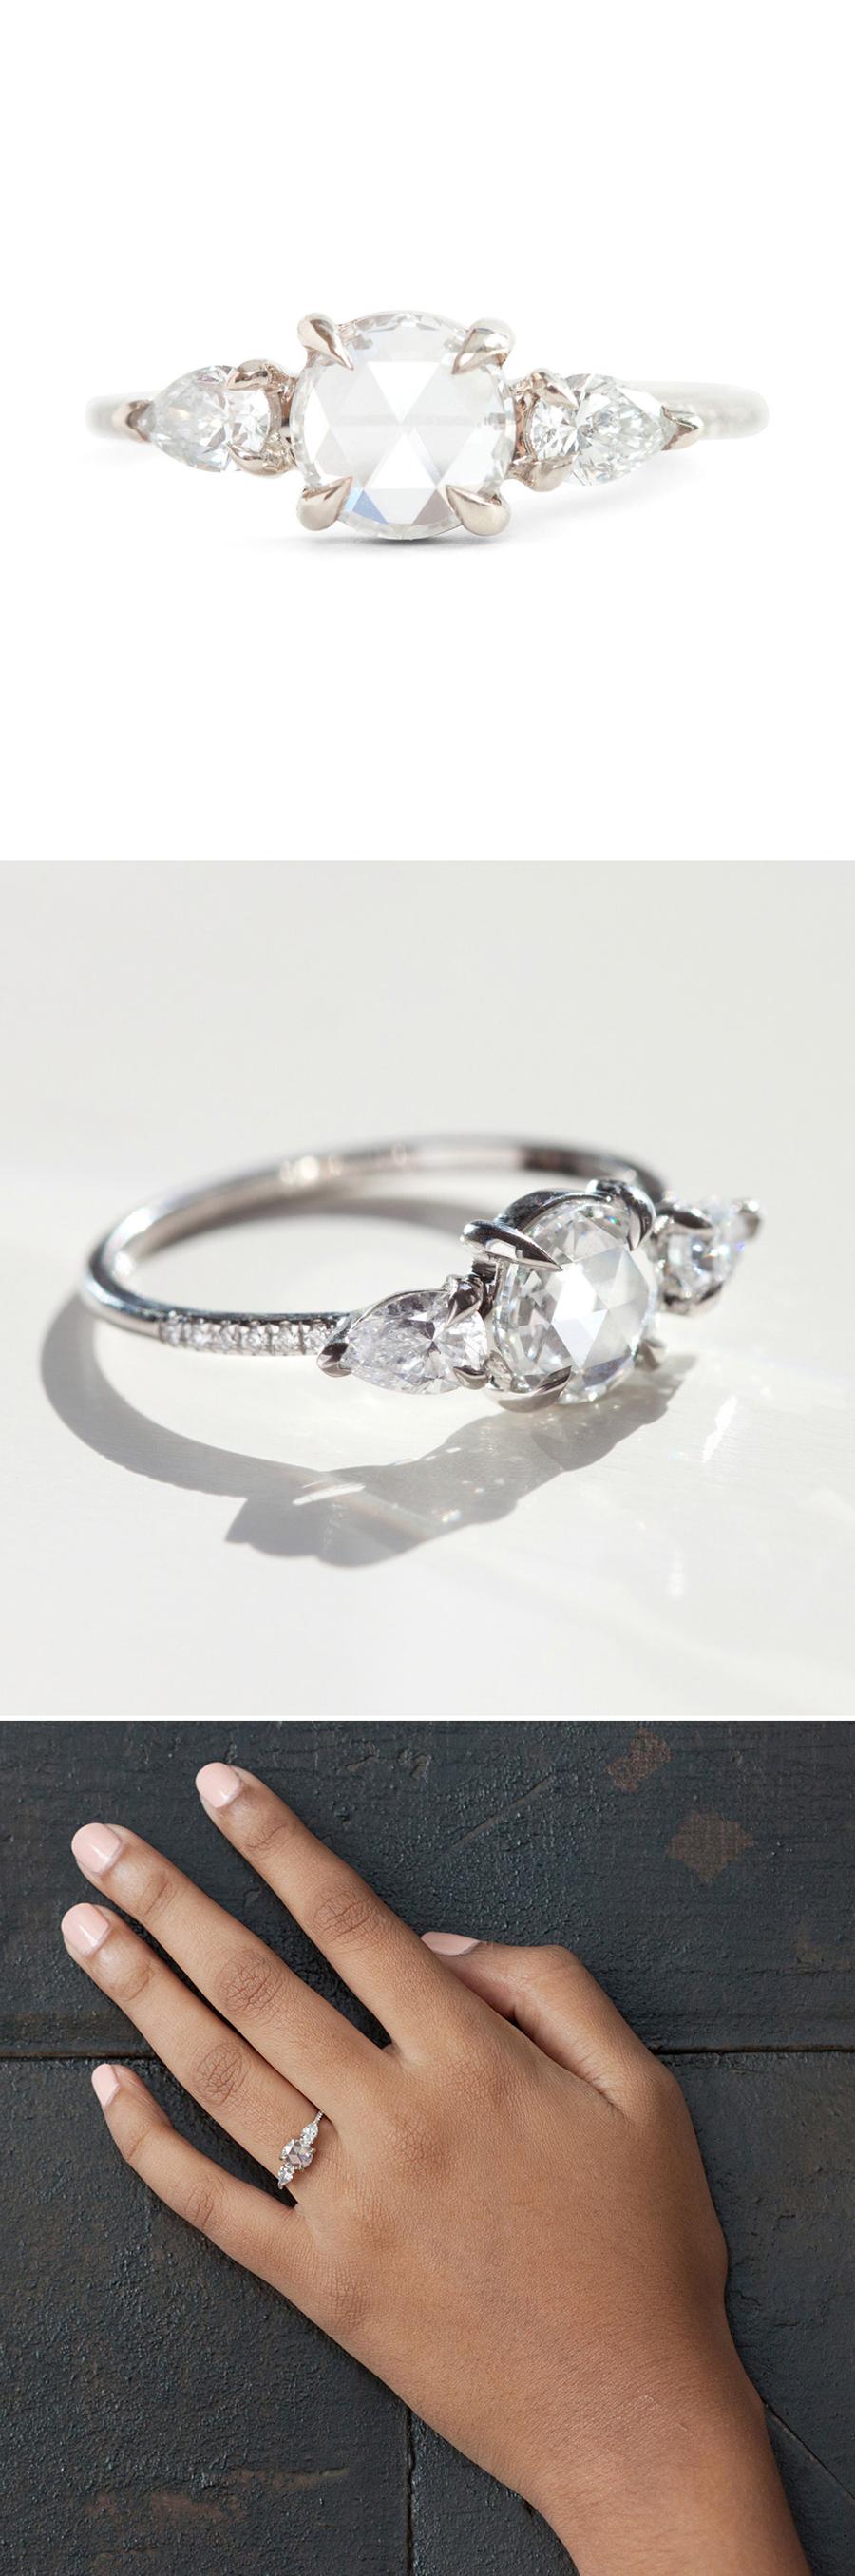 Women in Weddings Weigh in on Engagement Rings lotr wedding ring 27NatTheWeddingScoop PearGreyDiamond